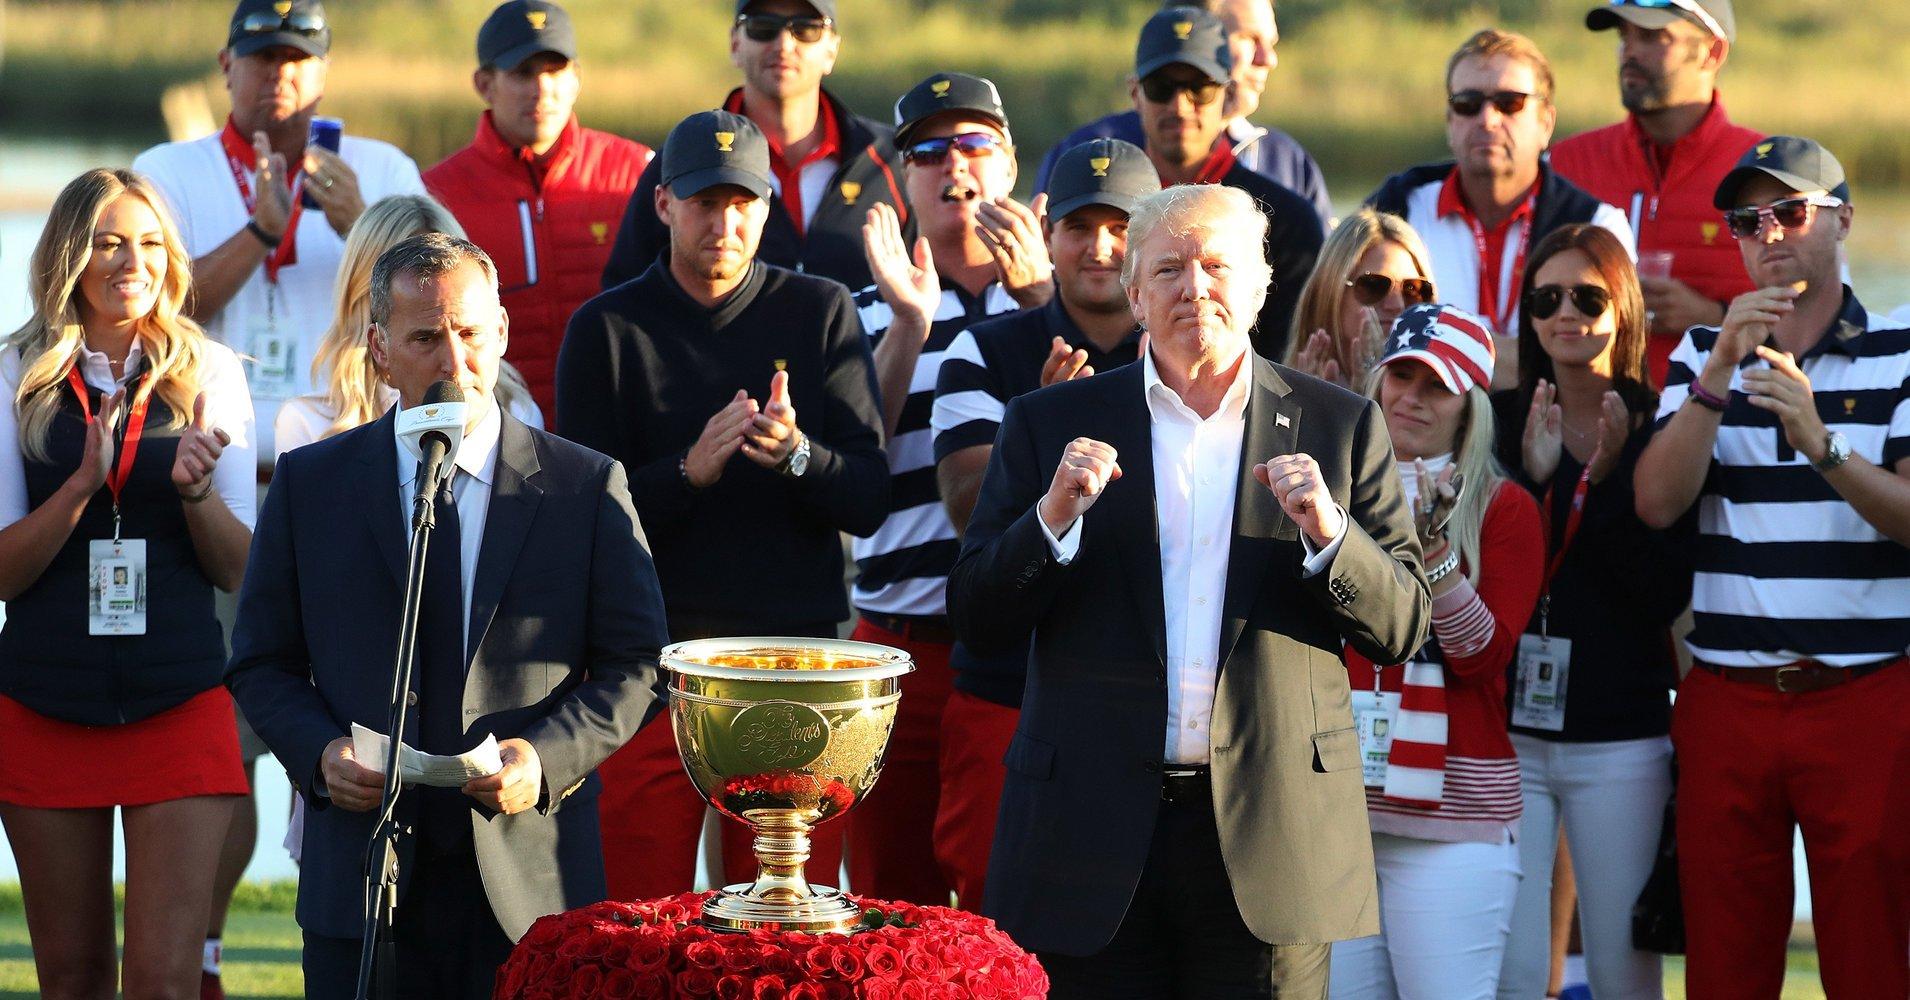 Trump dedicates golf trophy to hurricane victims https://t.co/HO3OOXKreF https://t.co/SQ4fq0FuhO